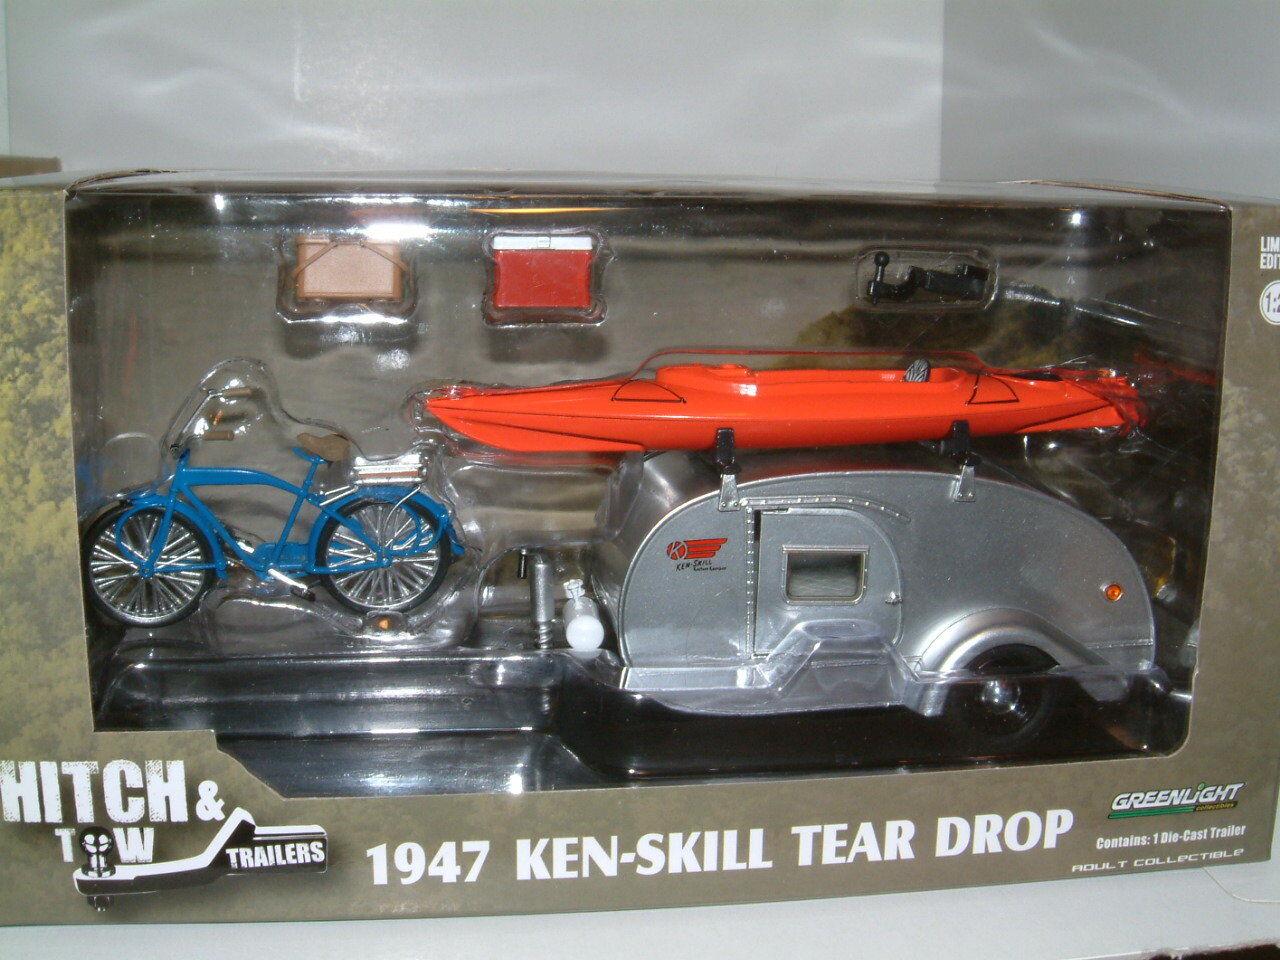 1 24 1947 KEN-SKILL TEAR DROP CARAVAN TRAILER, WITH ACCESSORIES. GREENLIGHT